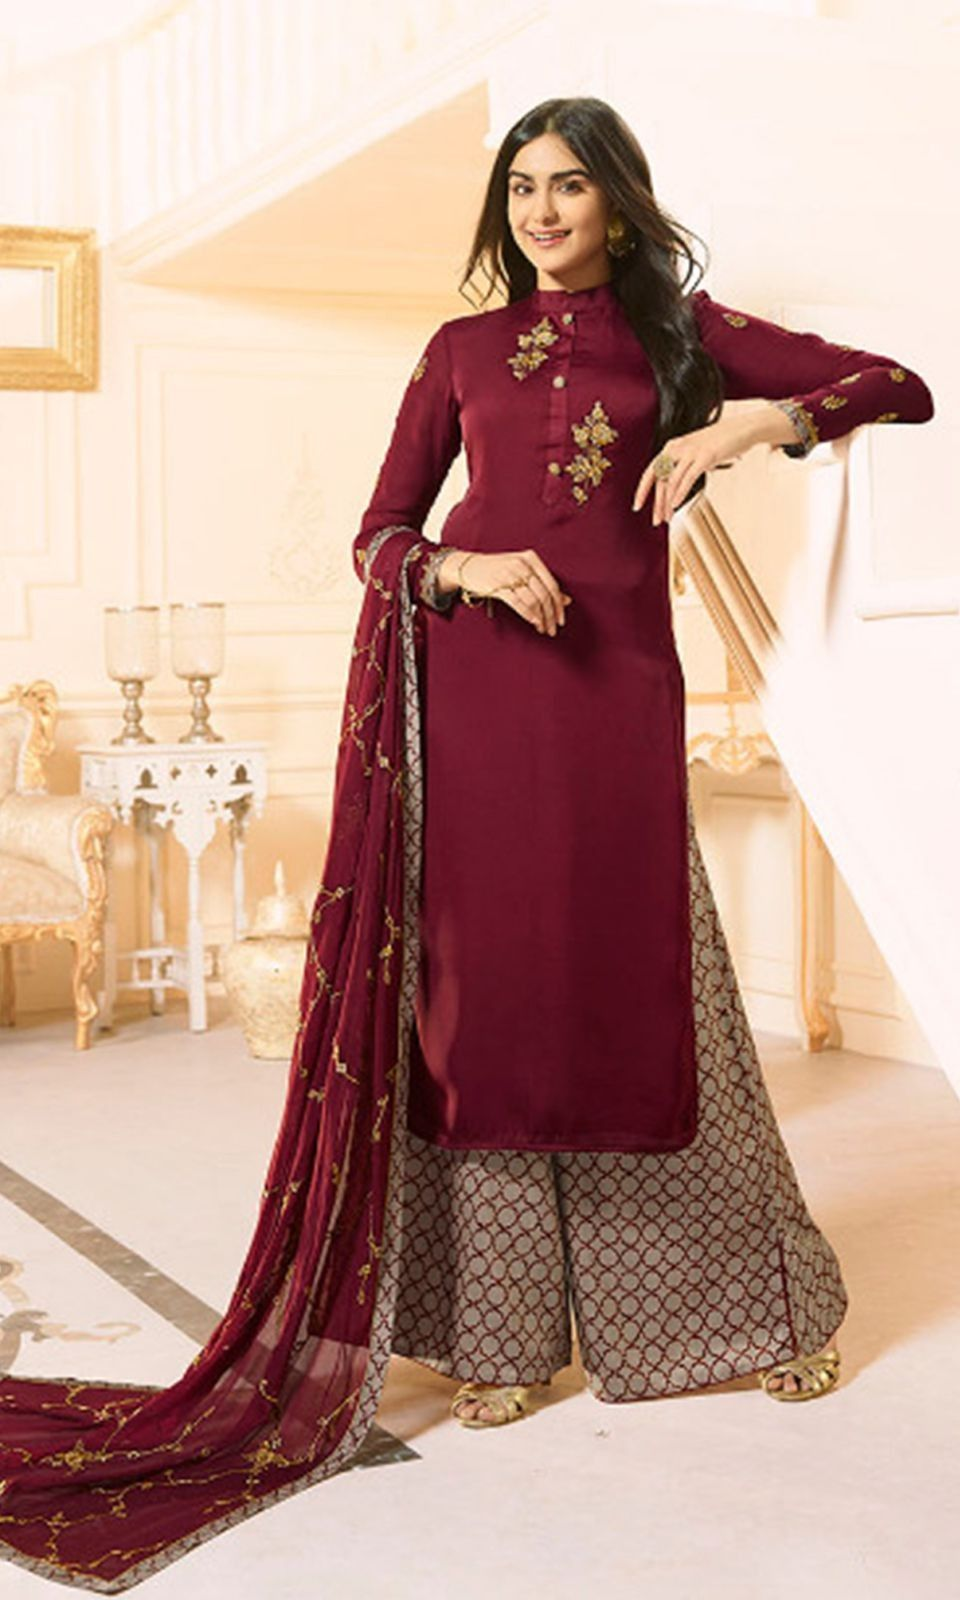 c8bef39ae0 Buy online #Maroon and #Grey #Designer #Sharara Style #Suit (SKU Code :  SUENMVF6638) at Ishimaya Fashion.